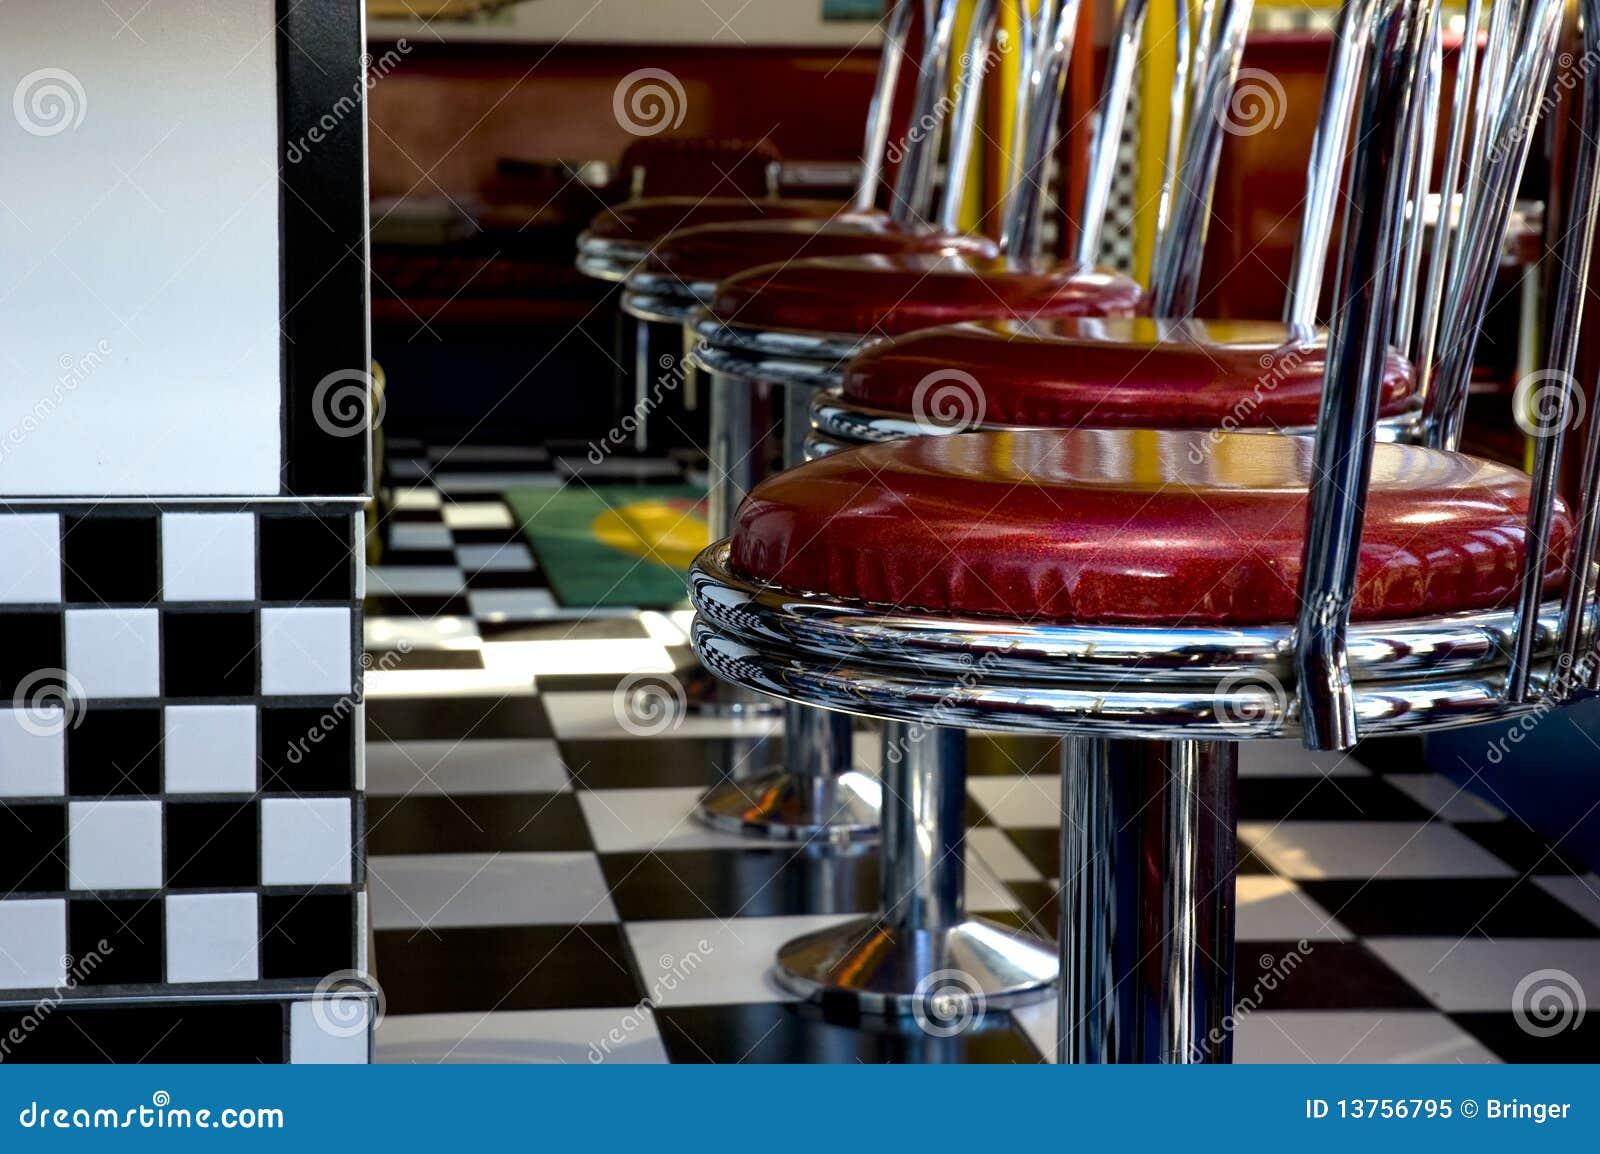 1950 S Diner Stock Image Image Of 1960s 1950s Vinyl